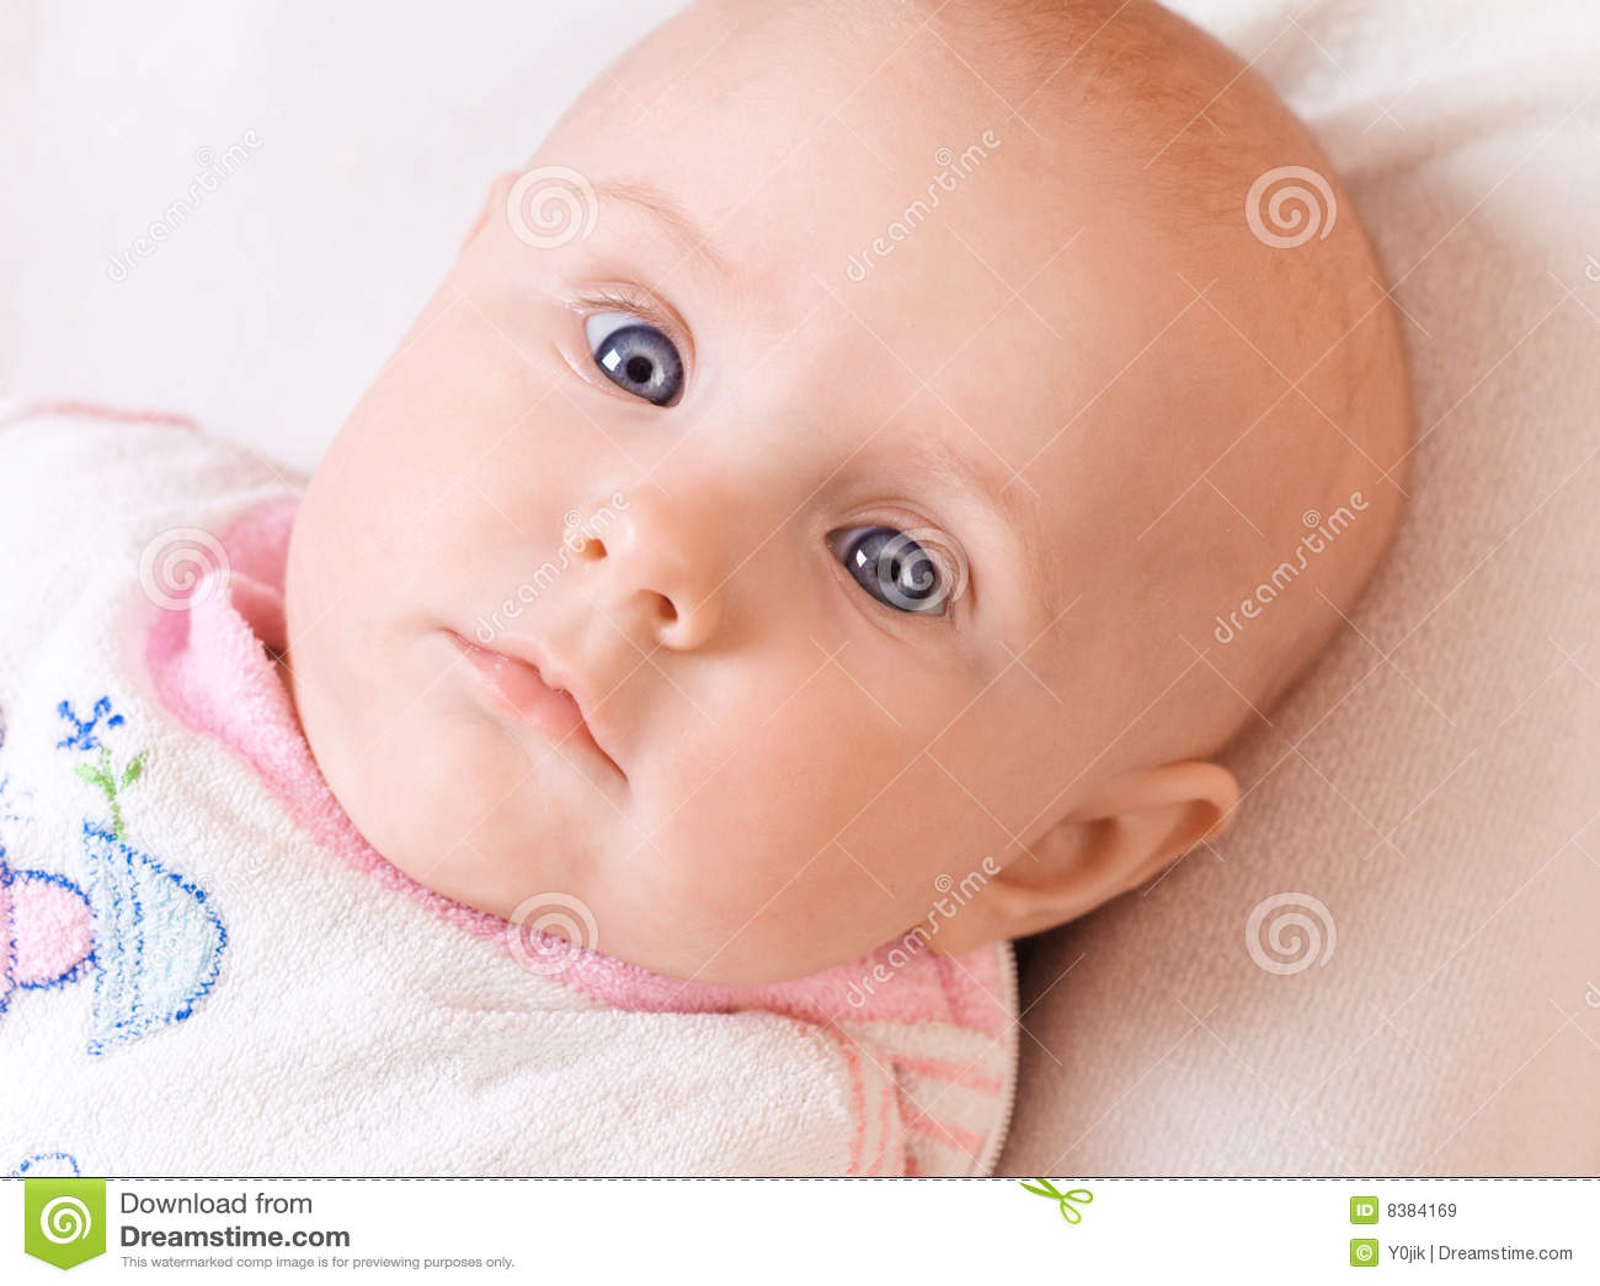 Babbucce con faccia da bambino